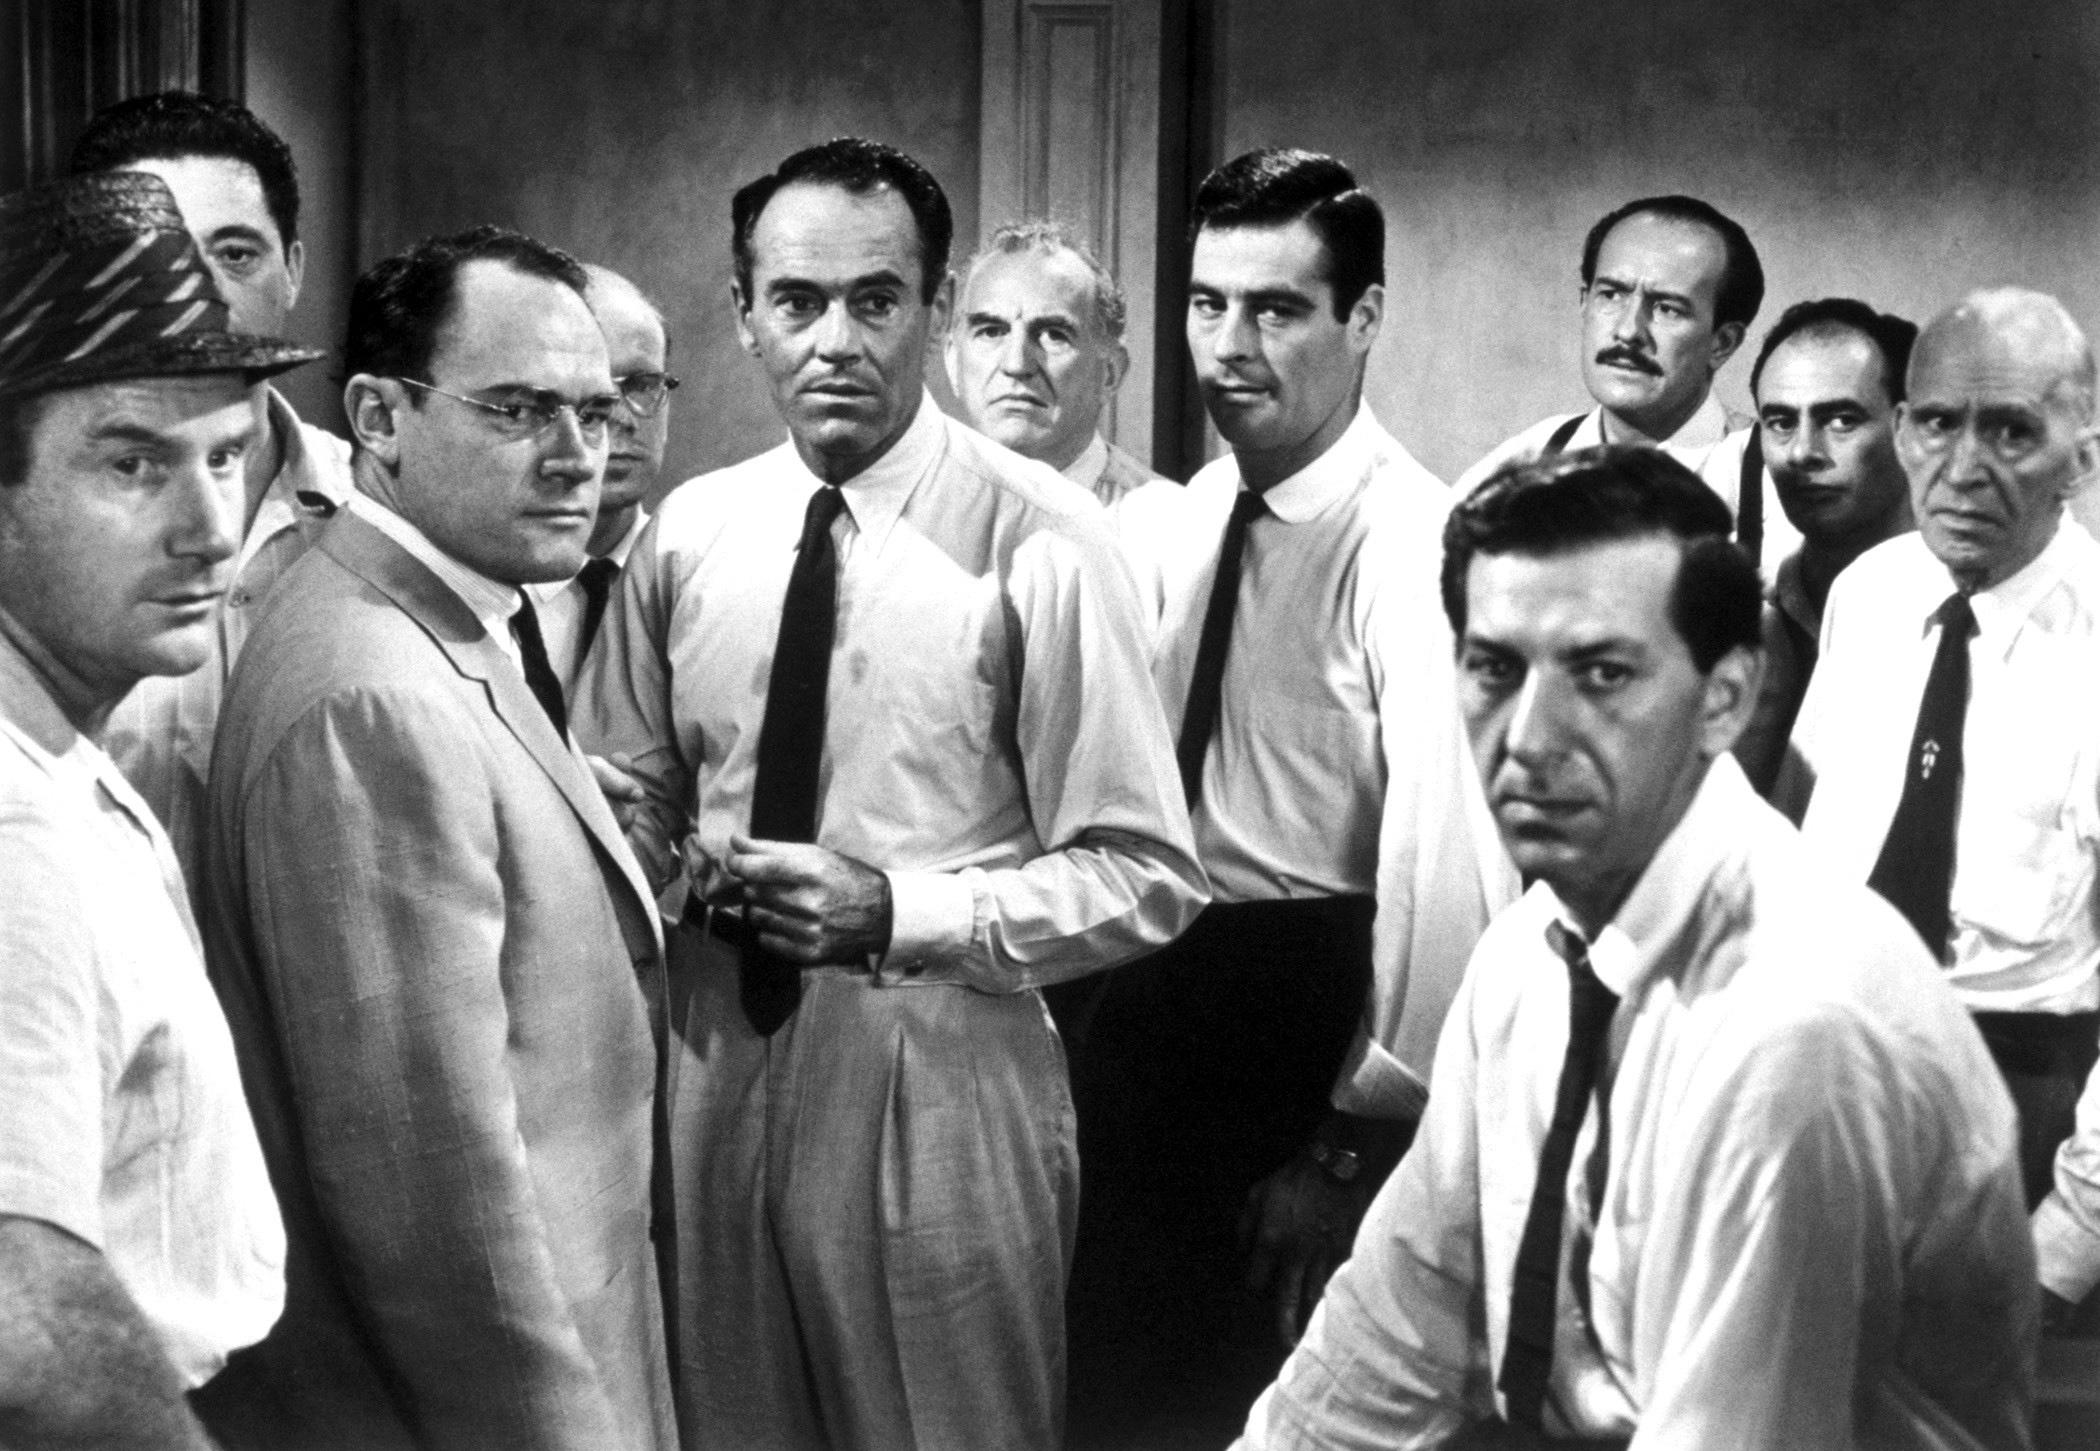 12 angry men by sidney lumet essay